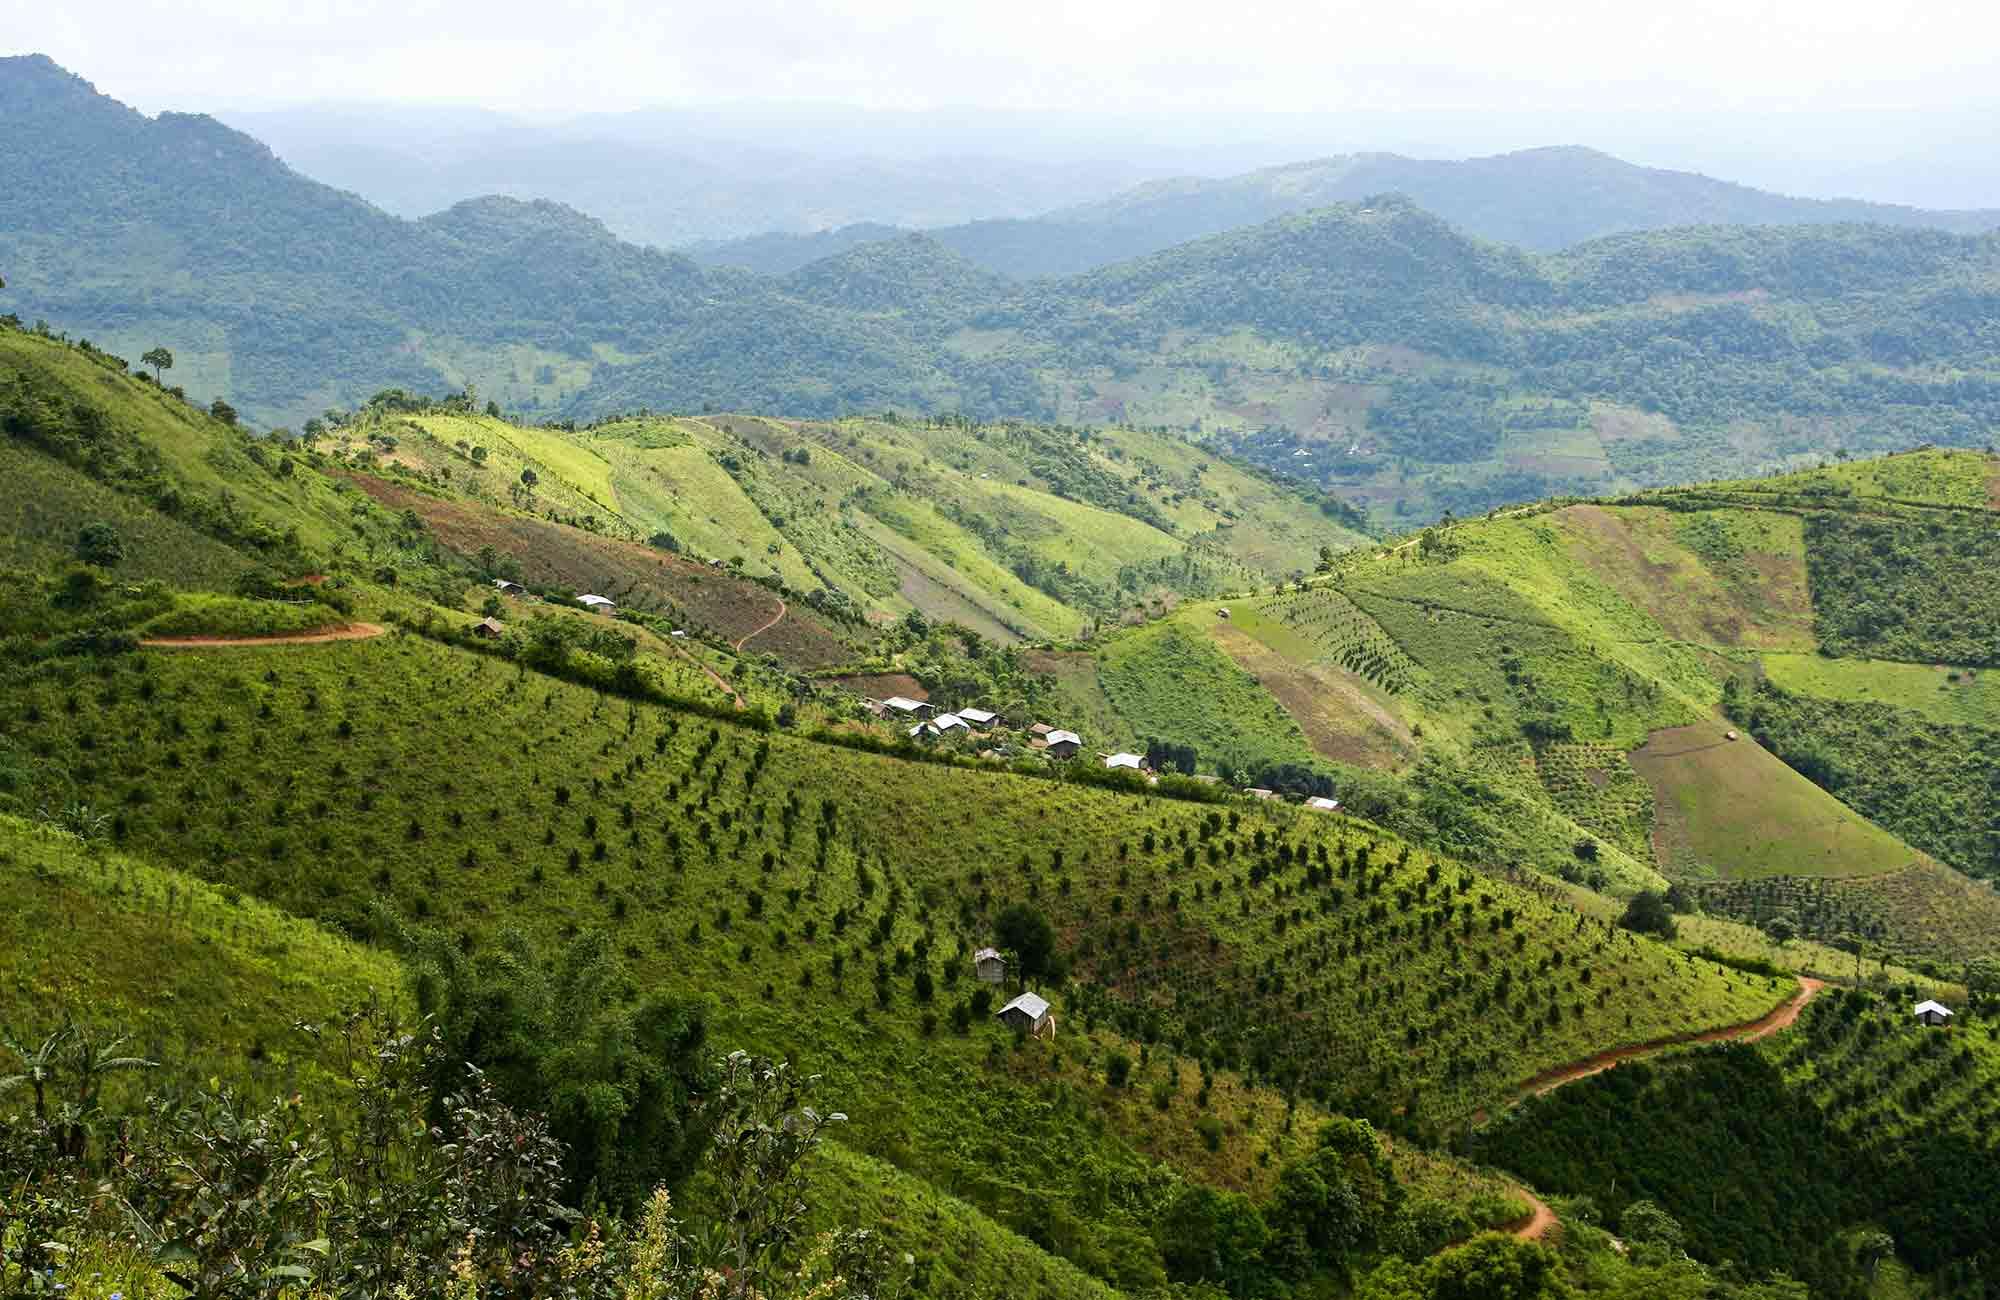 Voyage Birmanie-Myanmar - Kalaw - Amplitudes